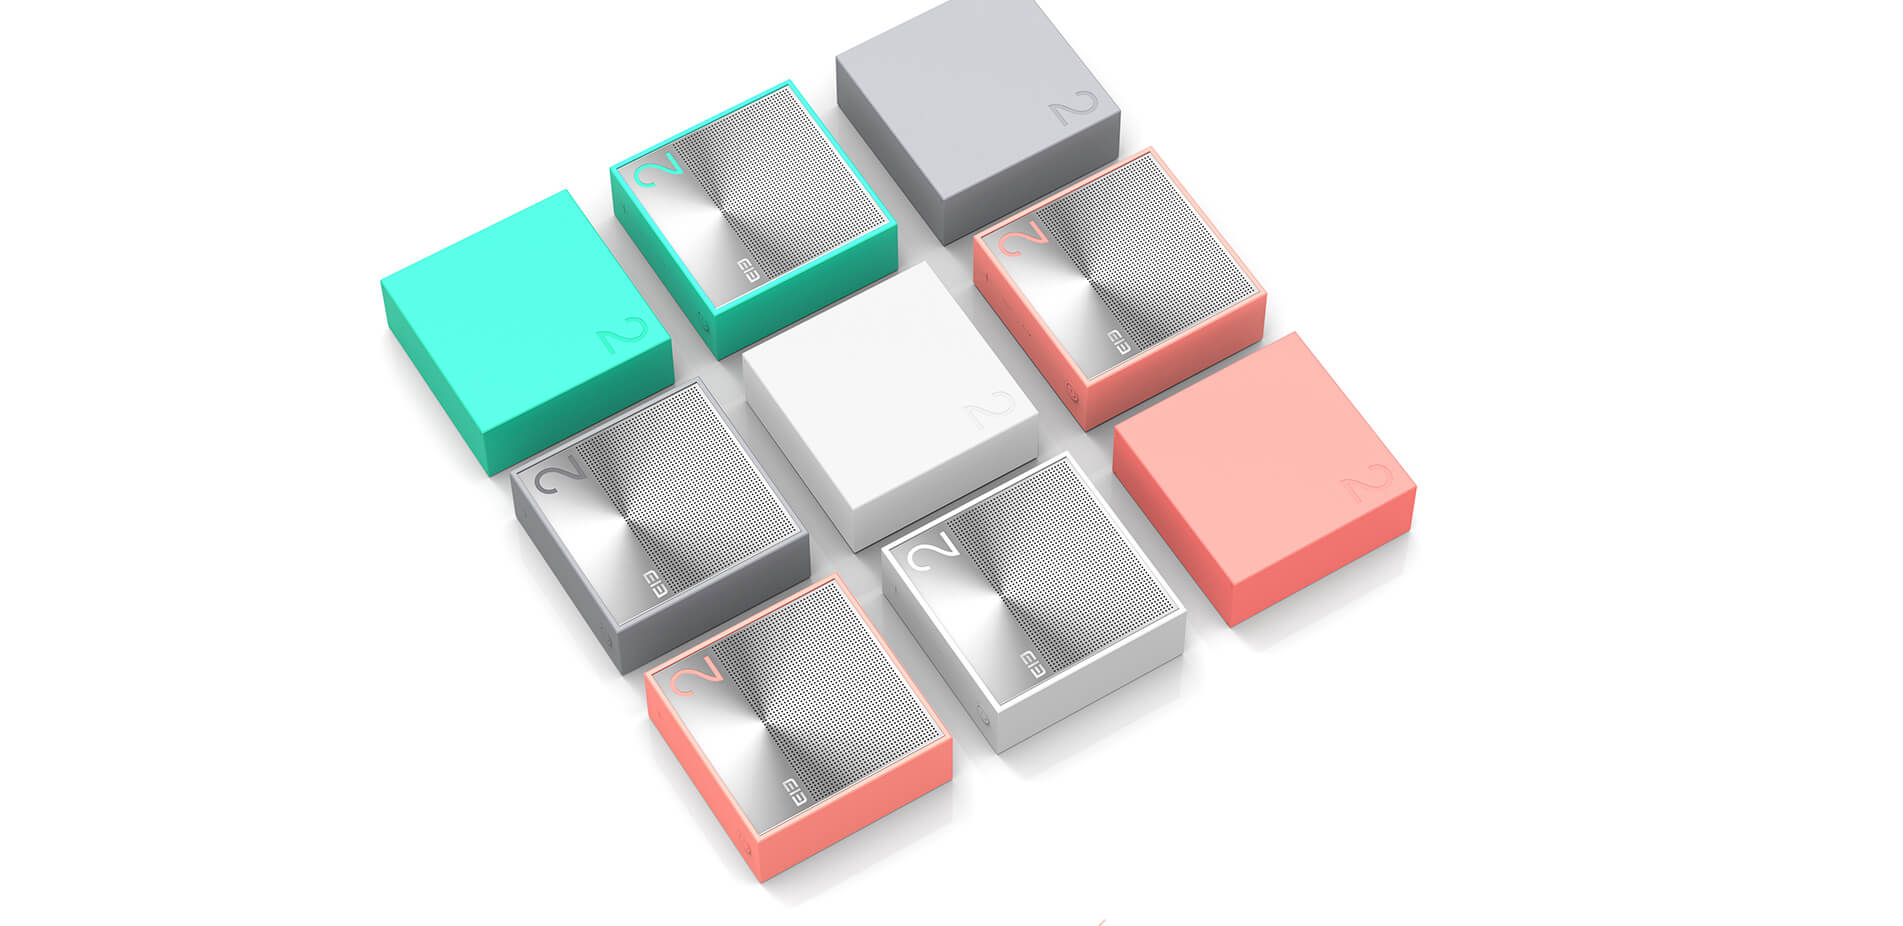 Elephone Ele-Box speaker